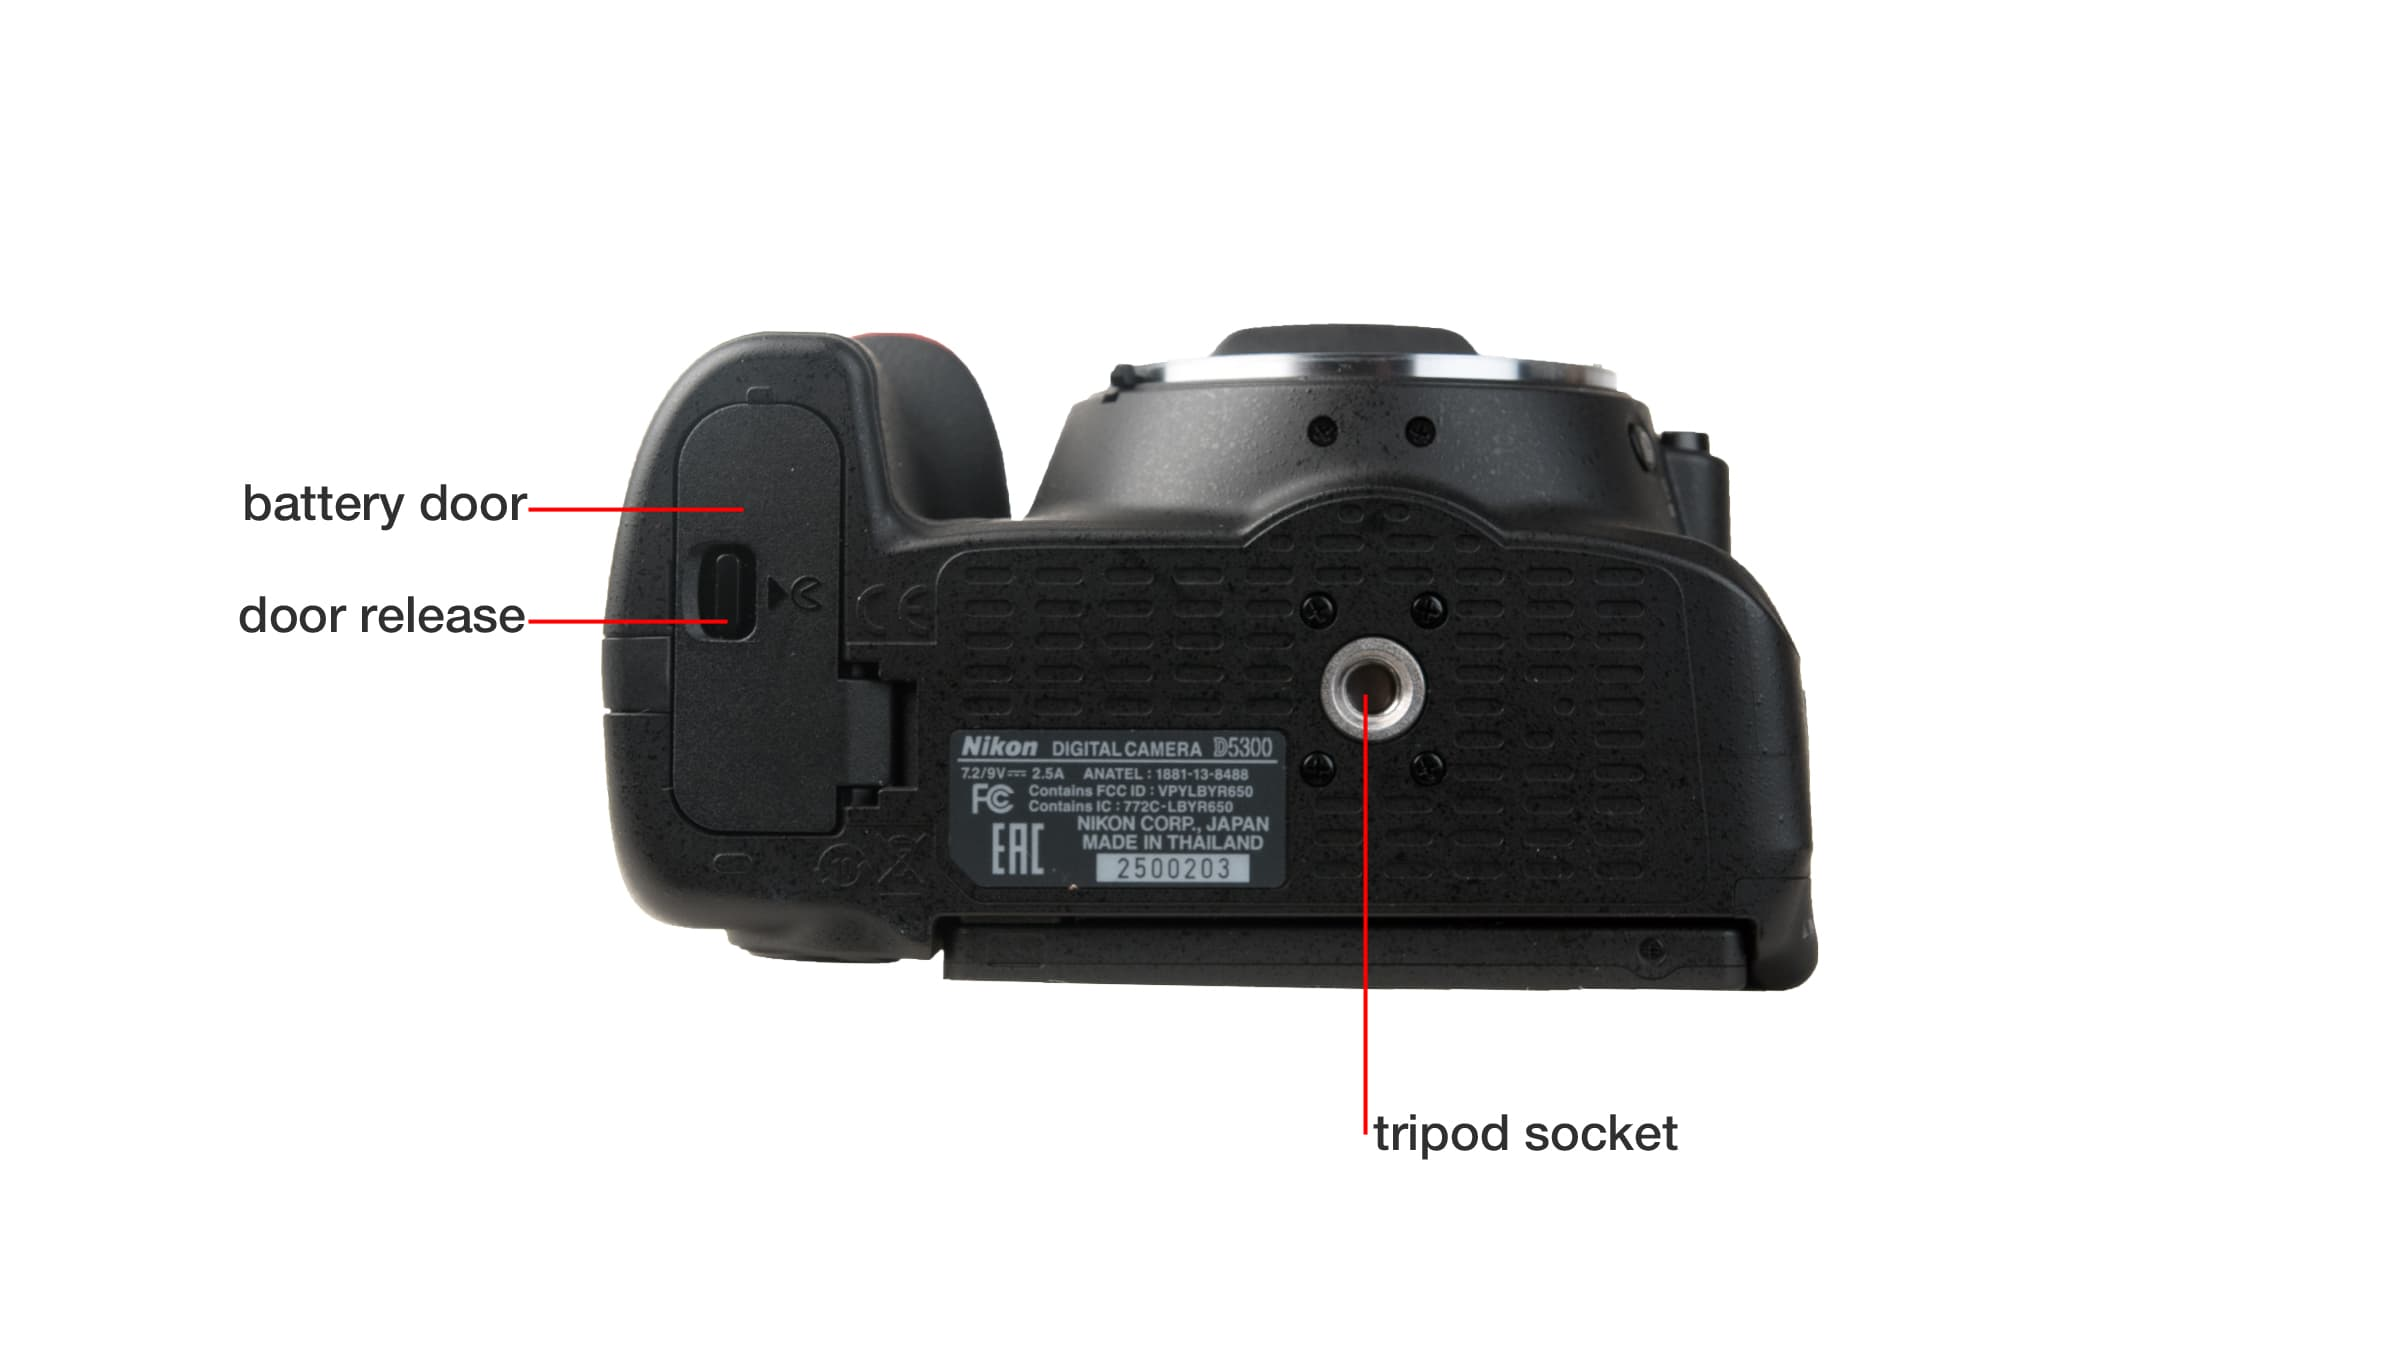 Bottom of Nikon D5300